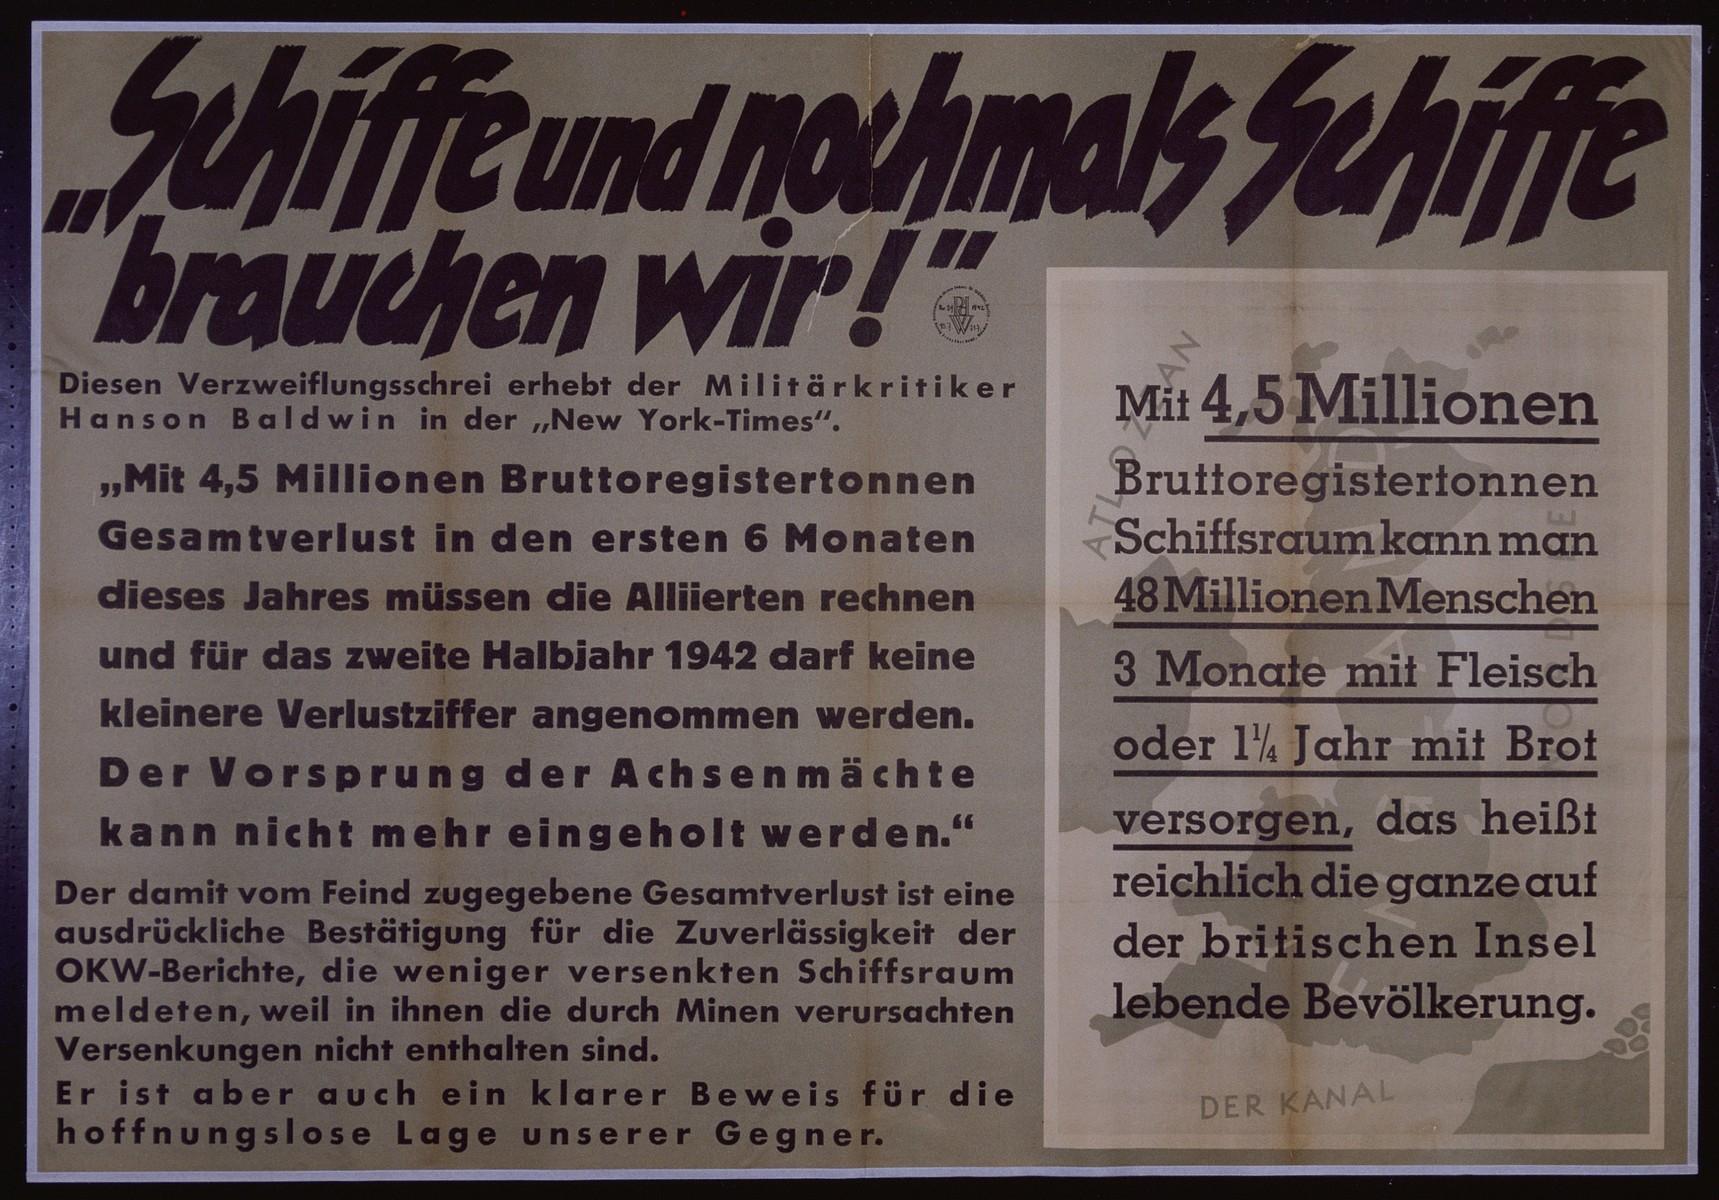 "Nazi propaganda poster entitled, ""Schiffe und nochmals Schiffe brauchen wir!"" issued by the ""Parole der Woche,"" a wall newspaper (Wandzeitung) published by the National Socialist Party propaganda office in Munich."